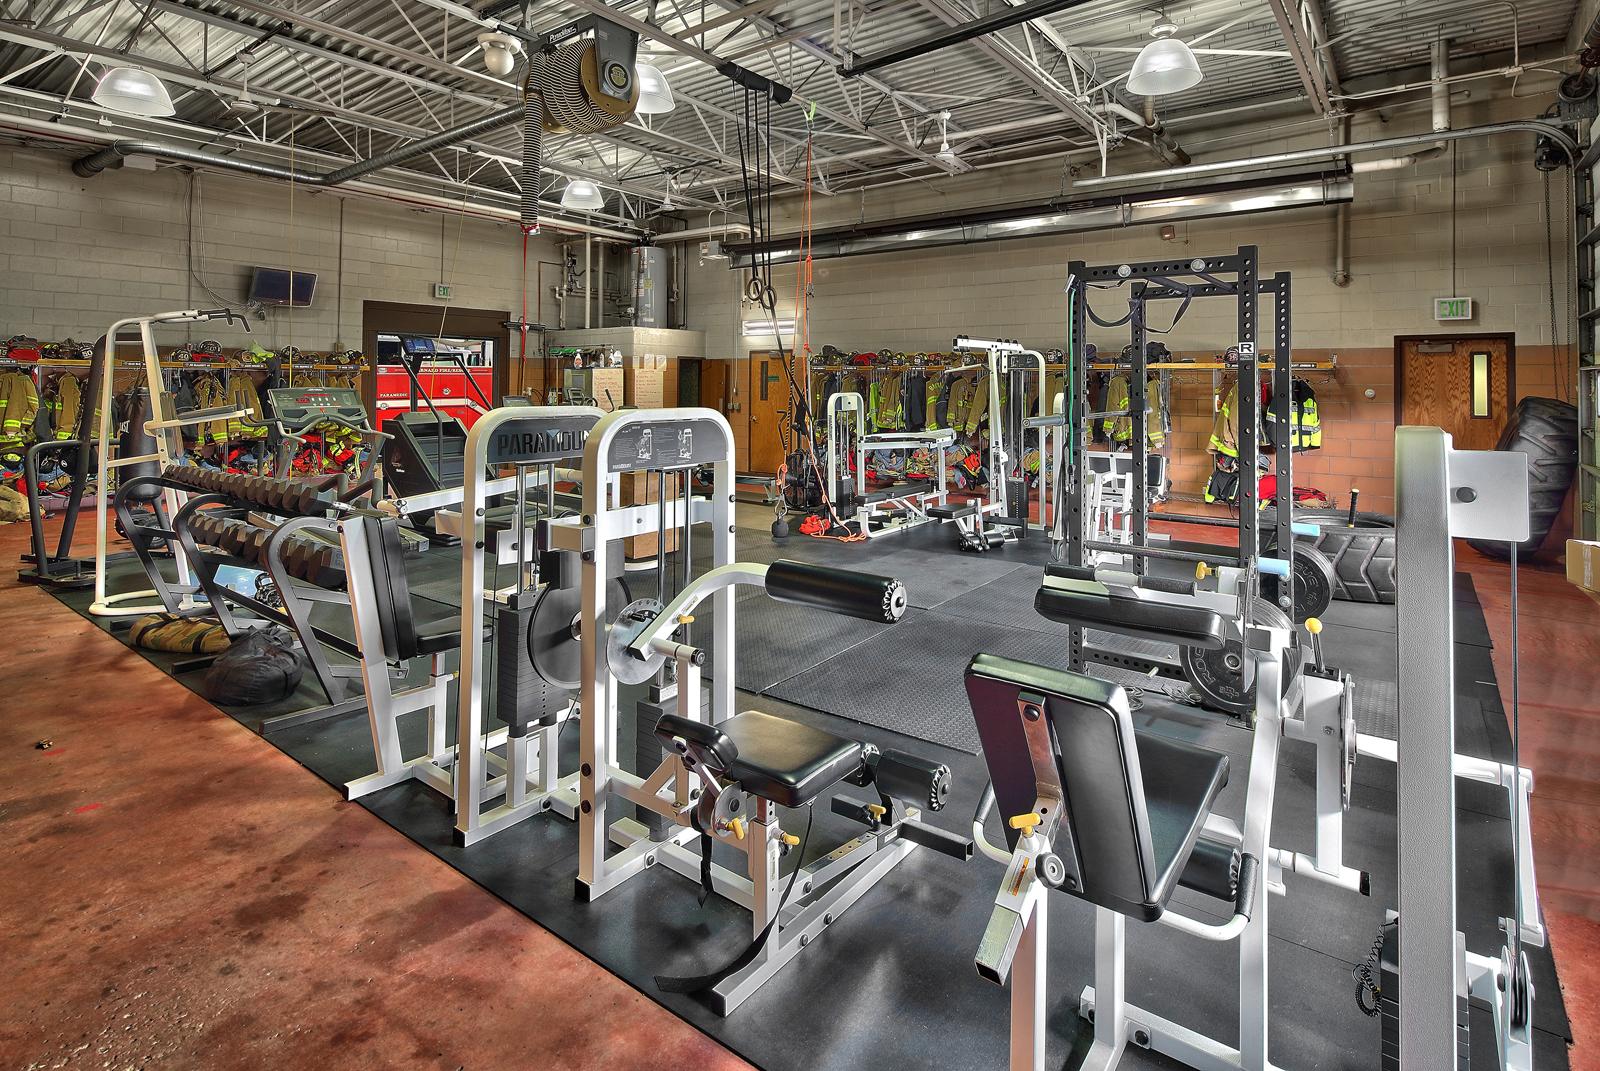 barnard-fs-gym.jpg